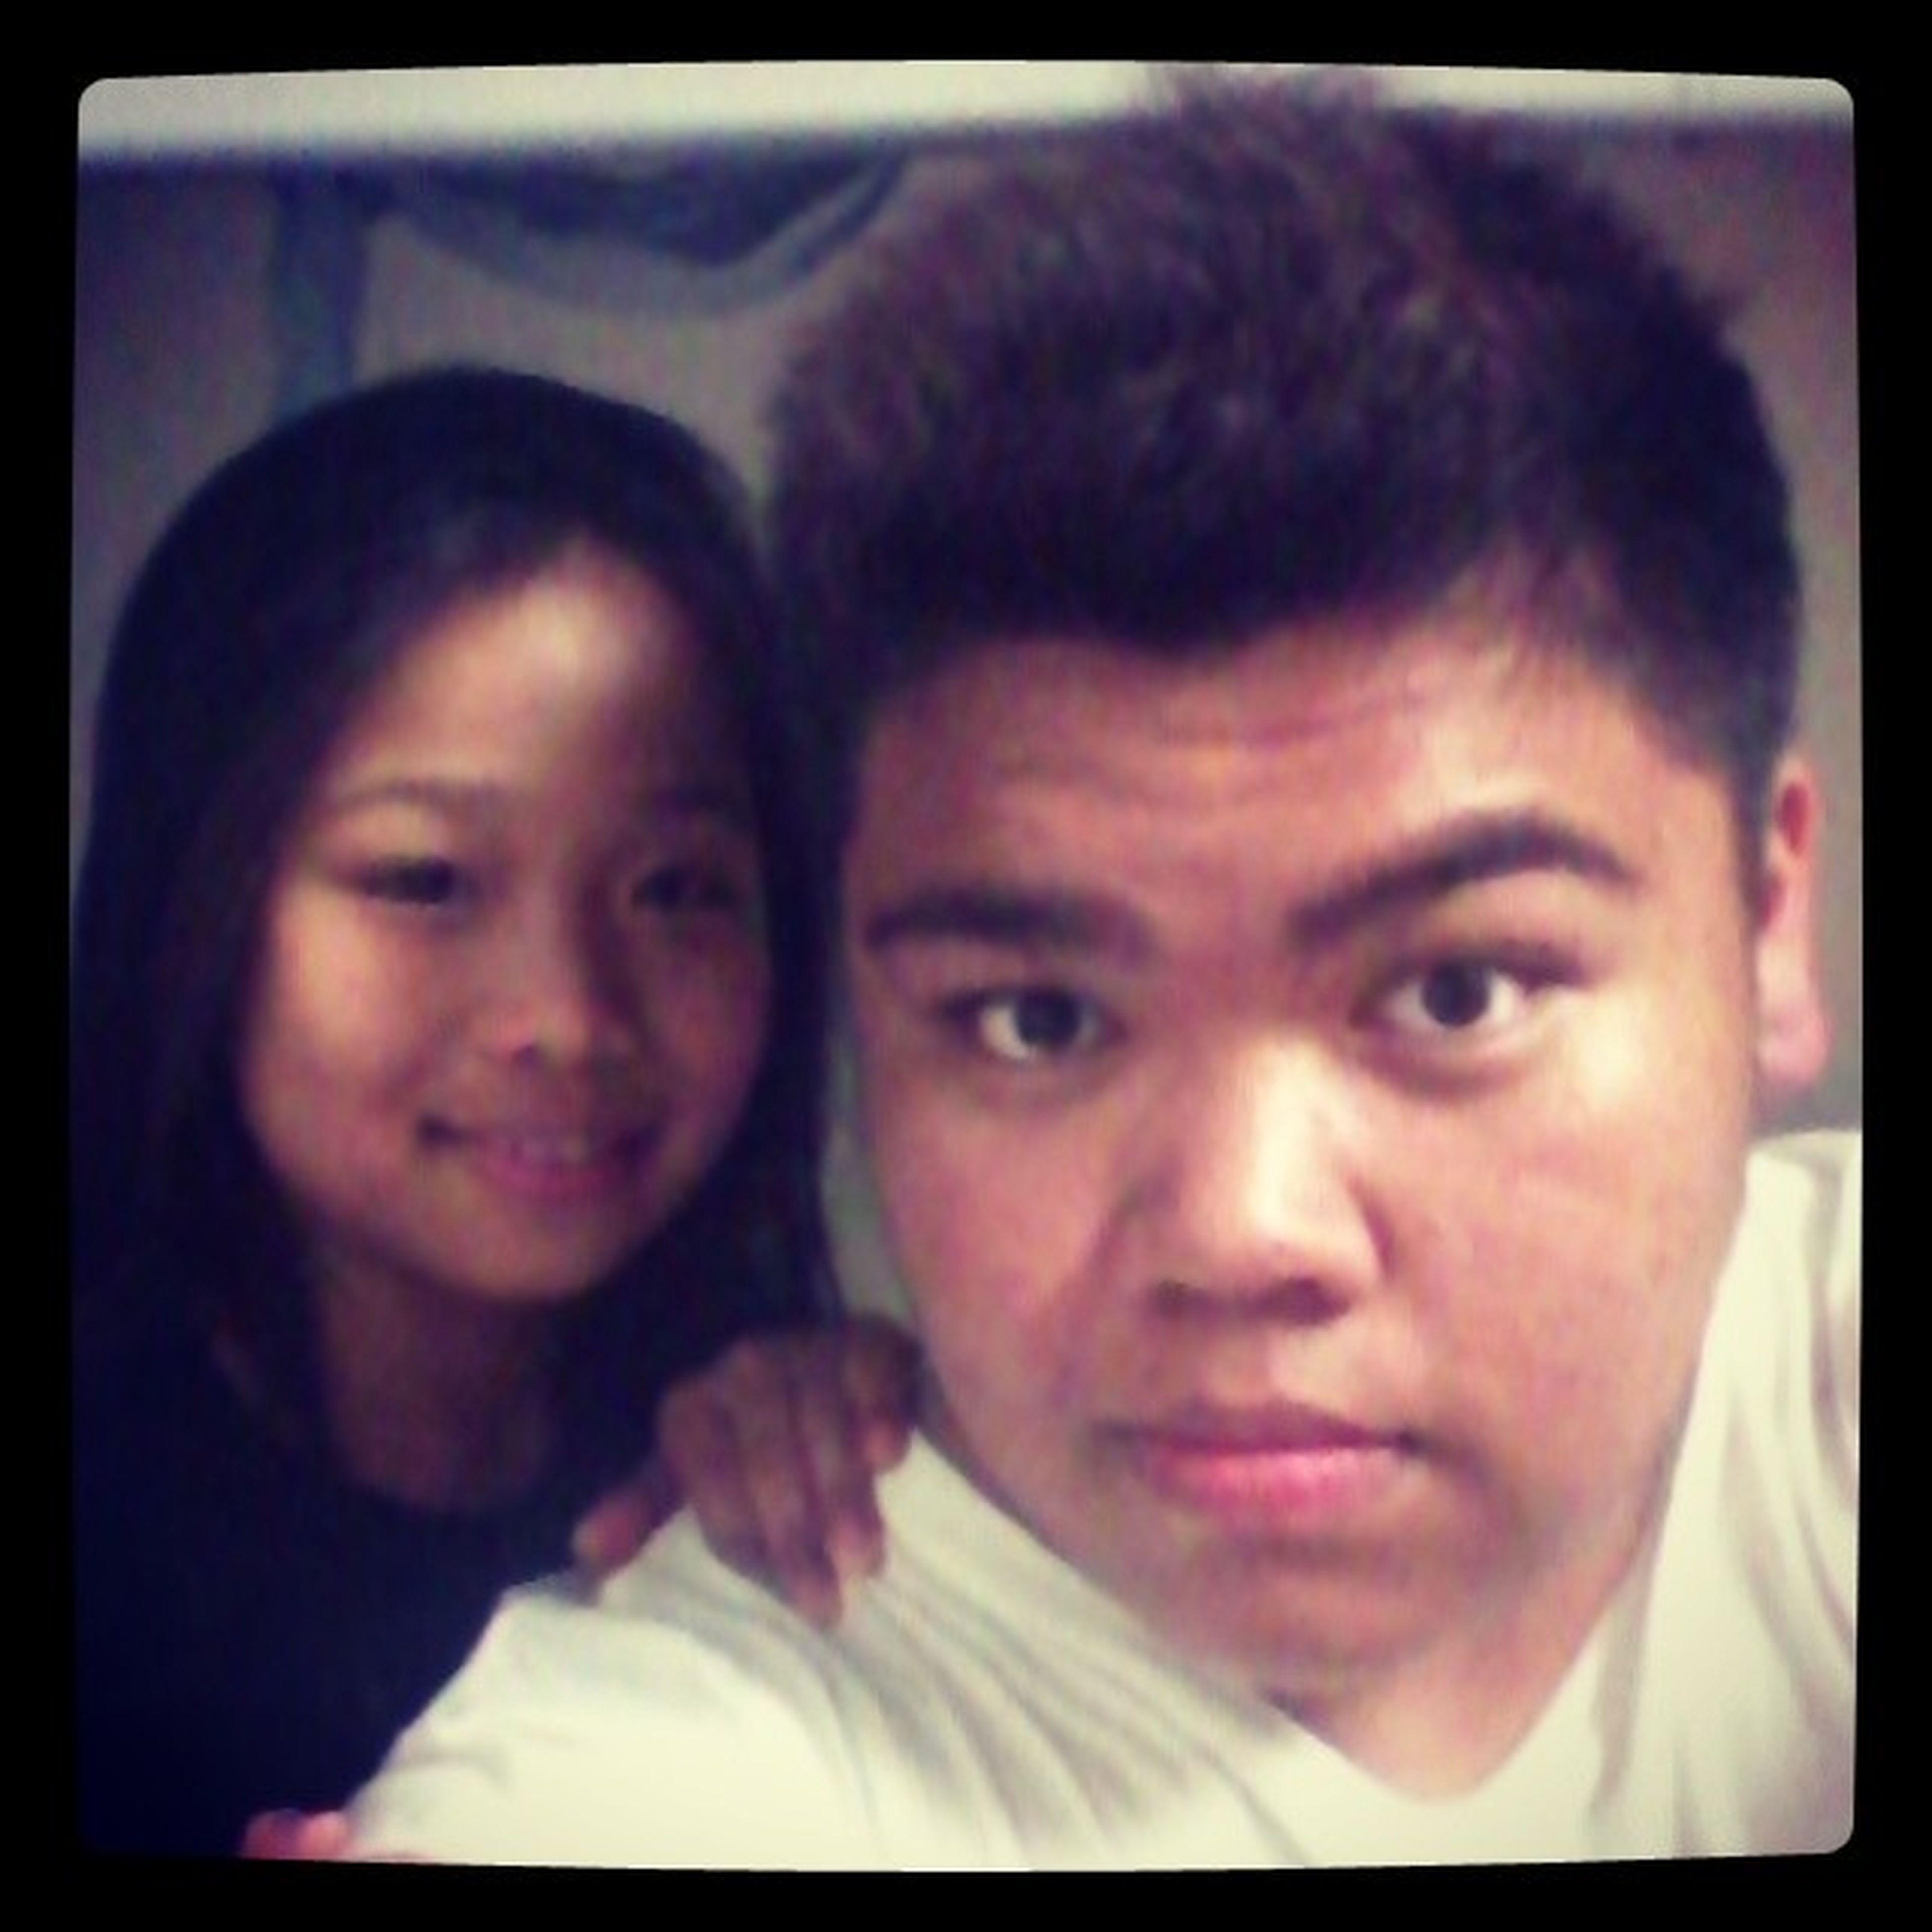 Taking pic with this lil girl Instapic Picoftheday Filipinopeople Asians instapostcoolpiclikesforlikestagforlikeslfltakingpicpinoyfollowme